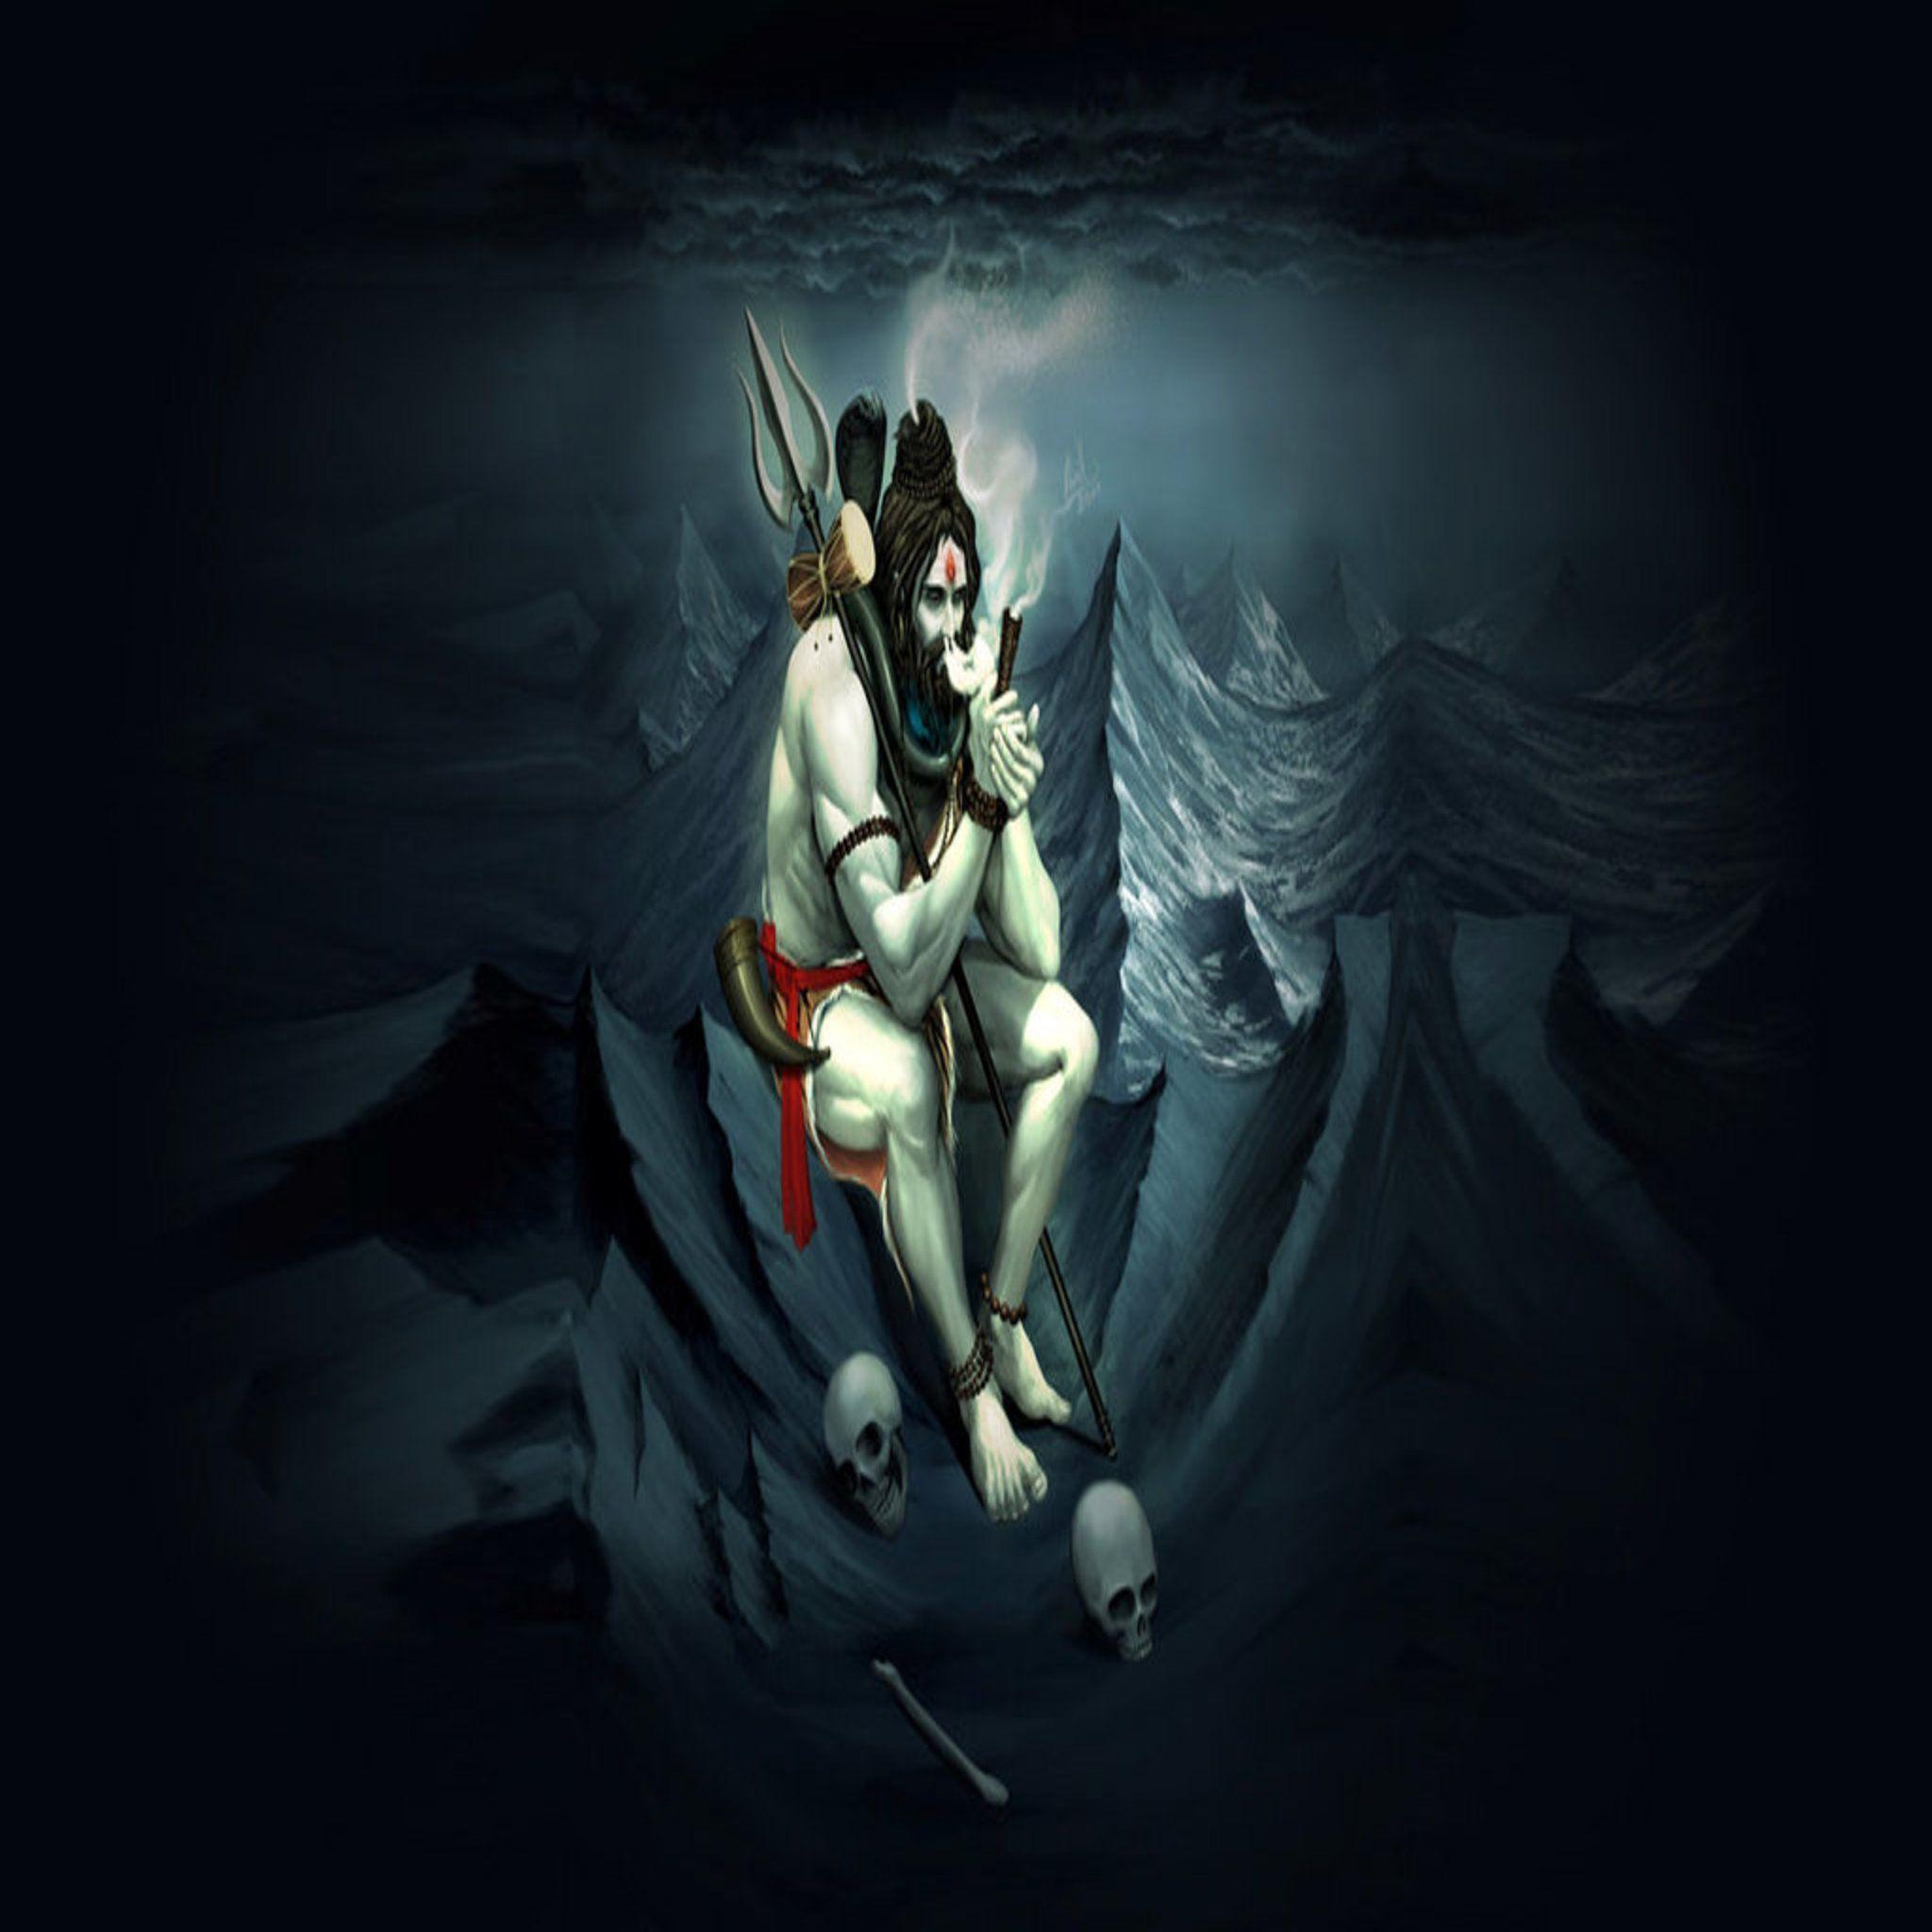 Shiva 4k Wallpaper Download - Gallery Wallpapers